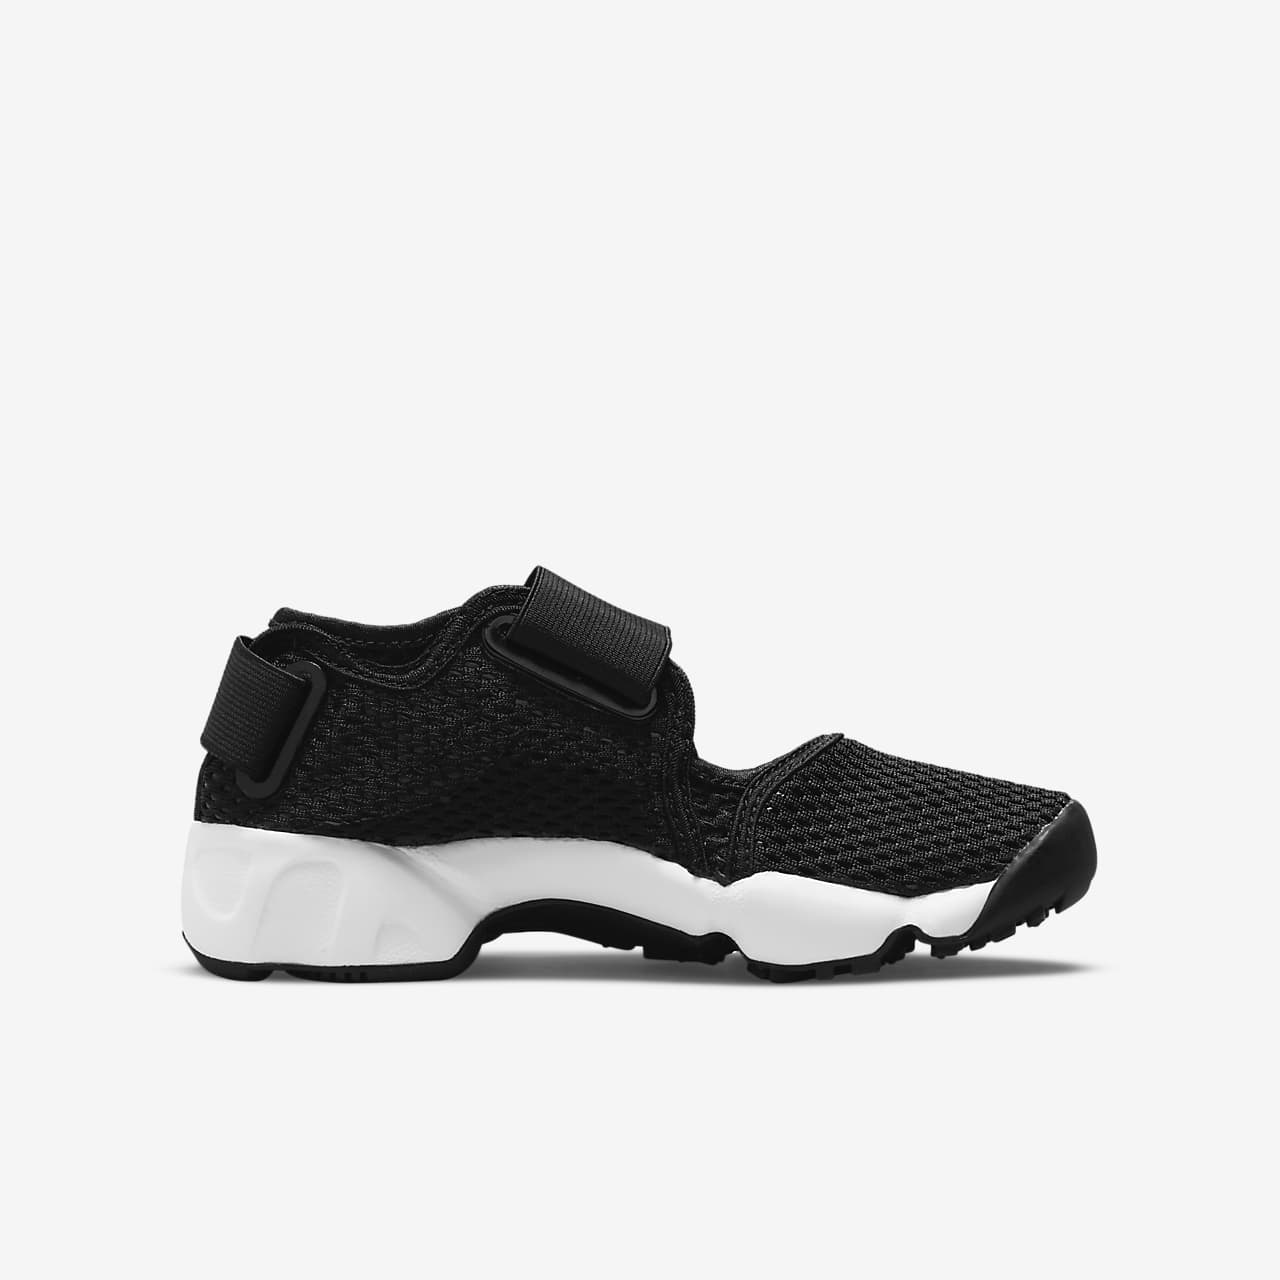 quality design 3bfb4 c0b7e ... Nike Air Rift – Chaussure pour Petit enfant (27,5-35)